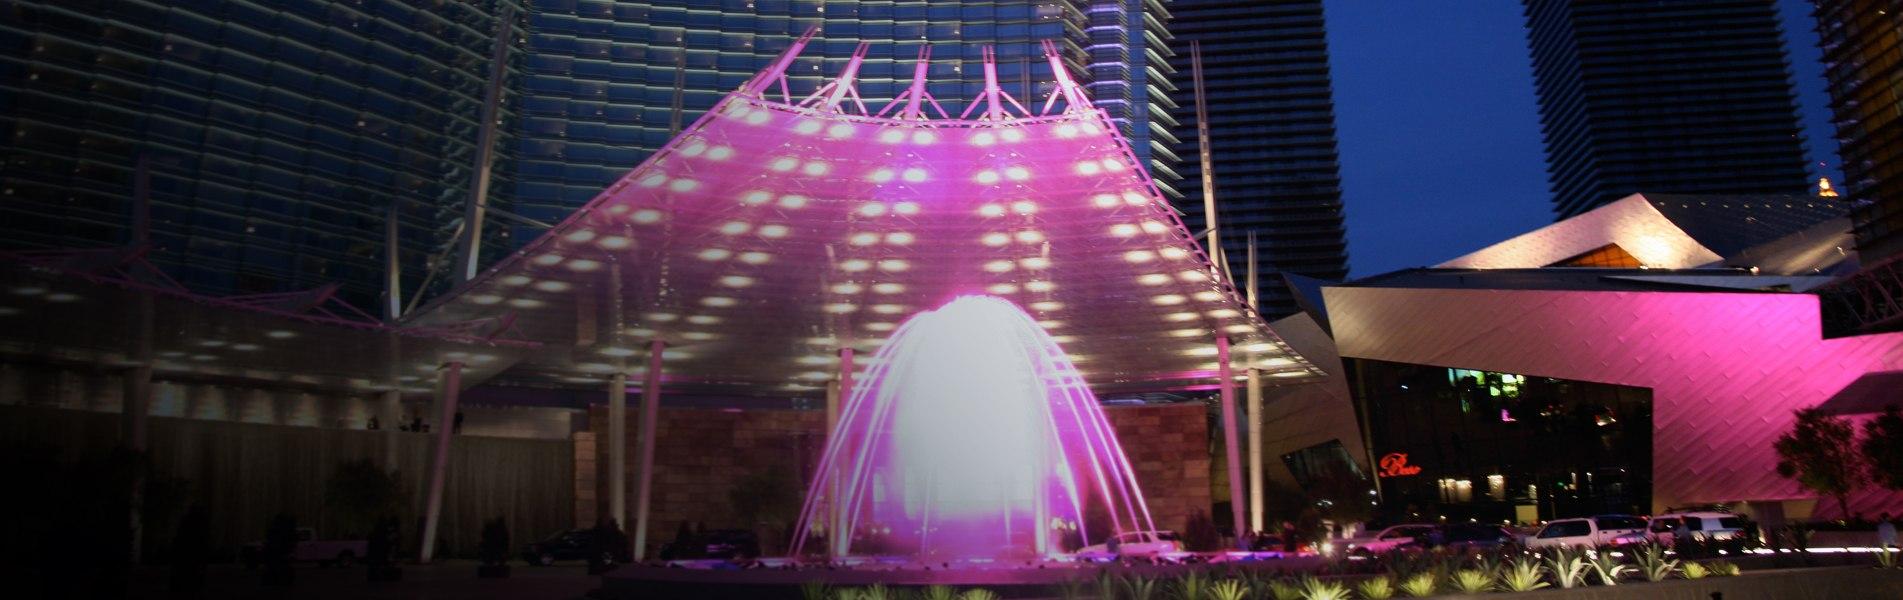 Aria at CityCenter Casino Las Vegas 1